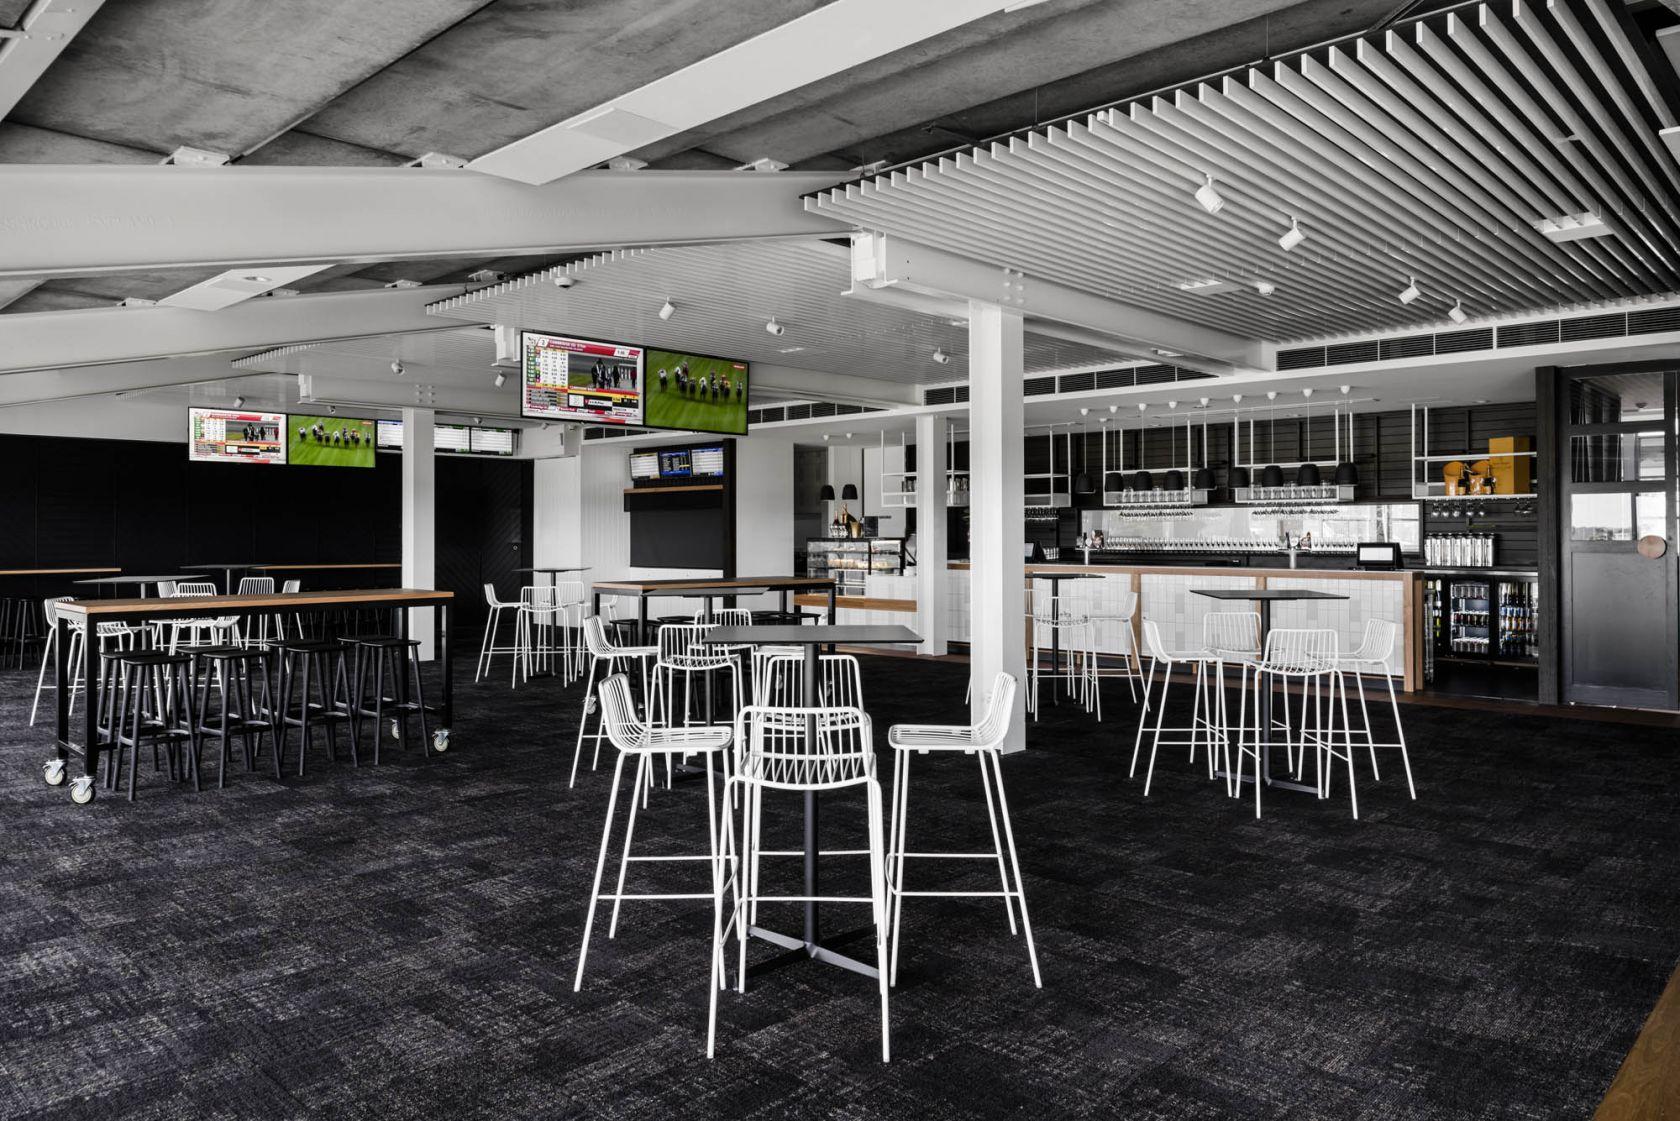 mornington racecourse melbourne fitout construction bar tv seating feature ceiling